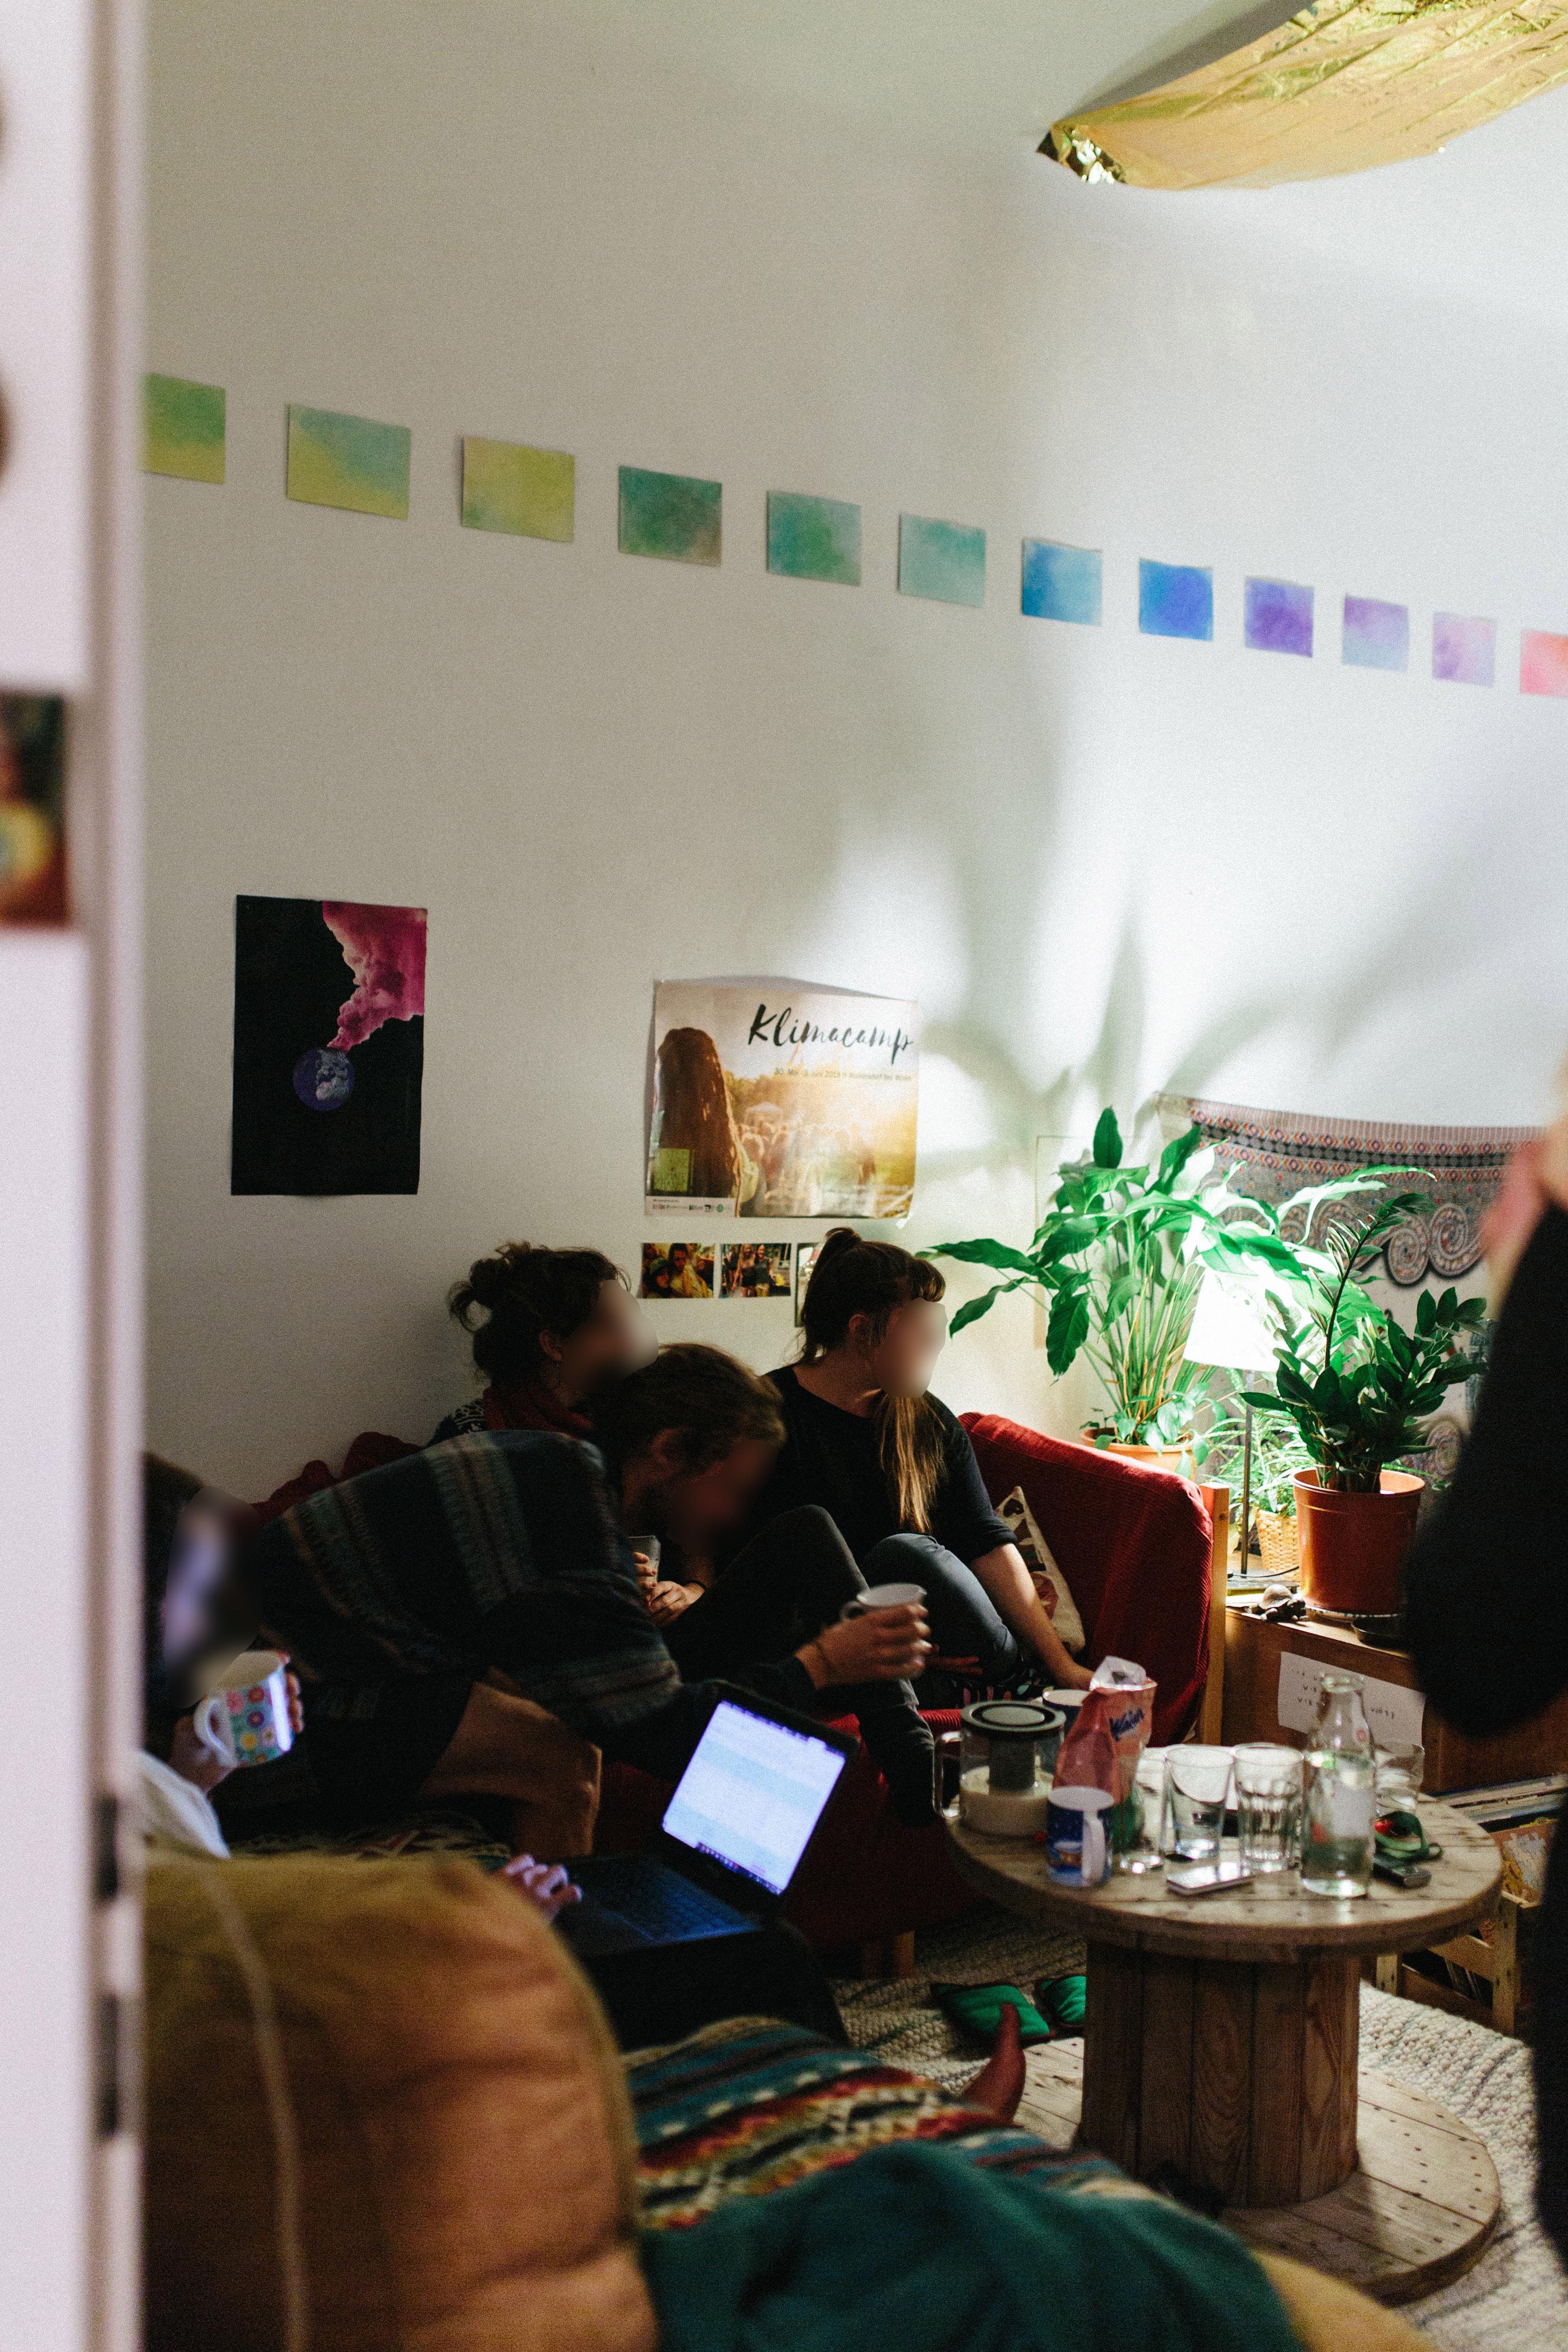 Mann sucht Frau Wien | Locanto Casual Dating Wien